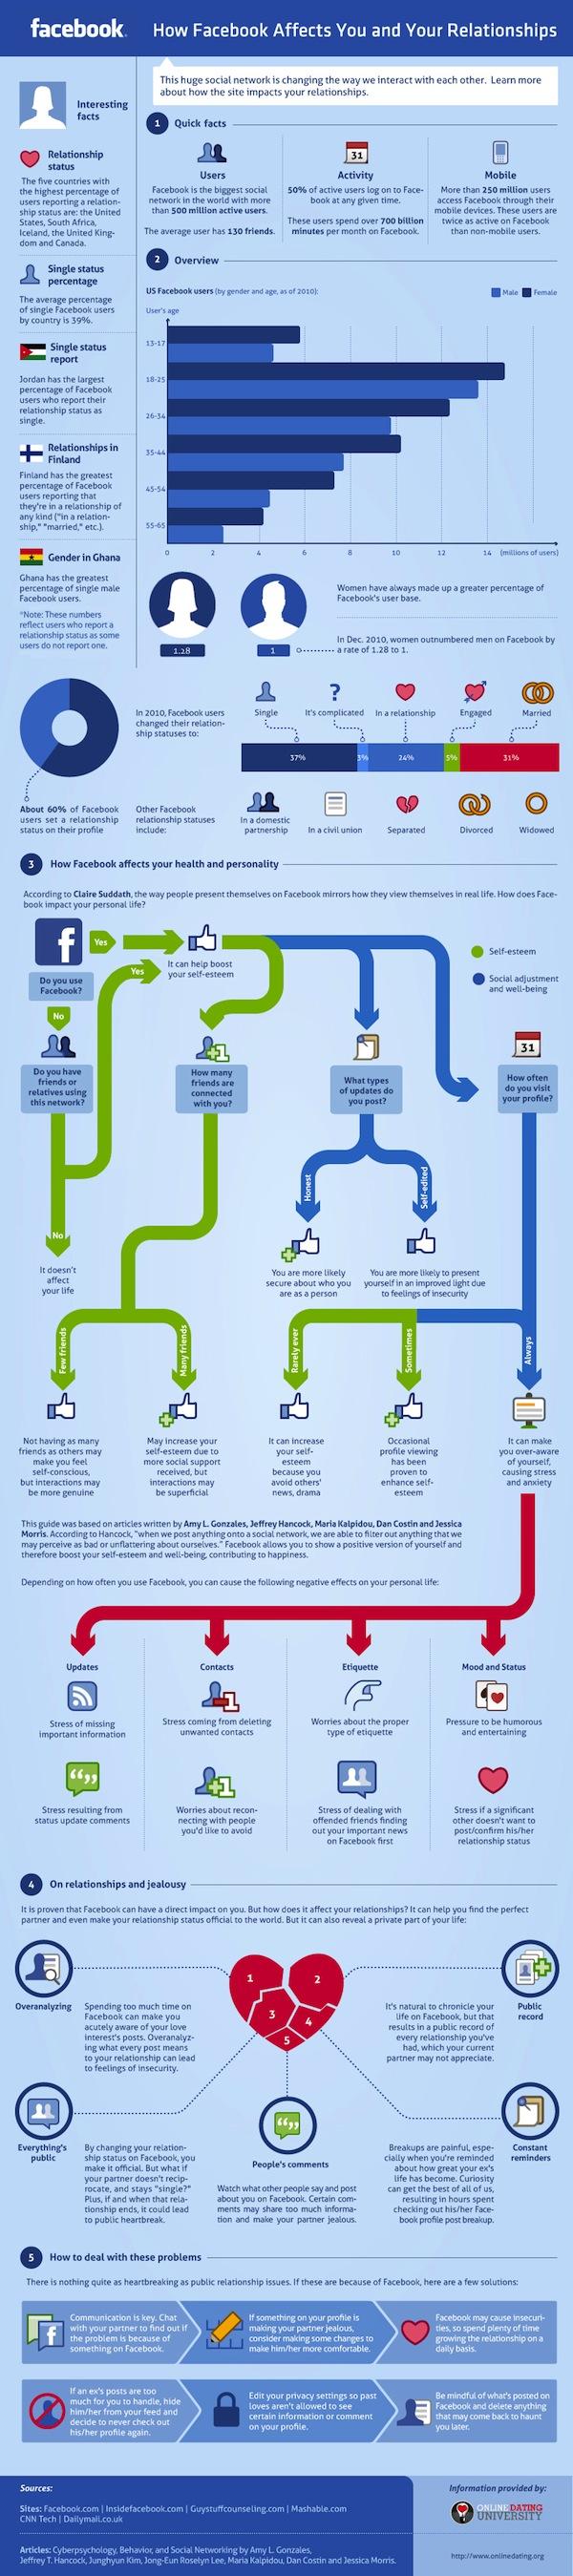 Como afecta Facebook a ti y a tus relaciones [Infografía] - facebook-relationships-infographic